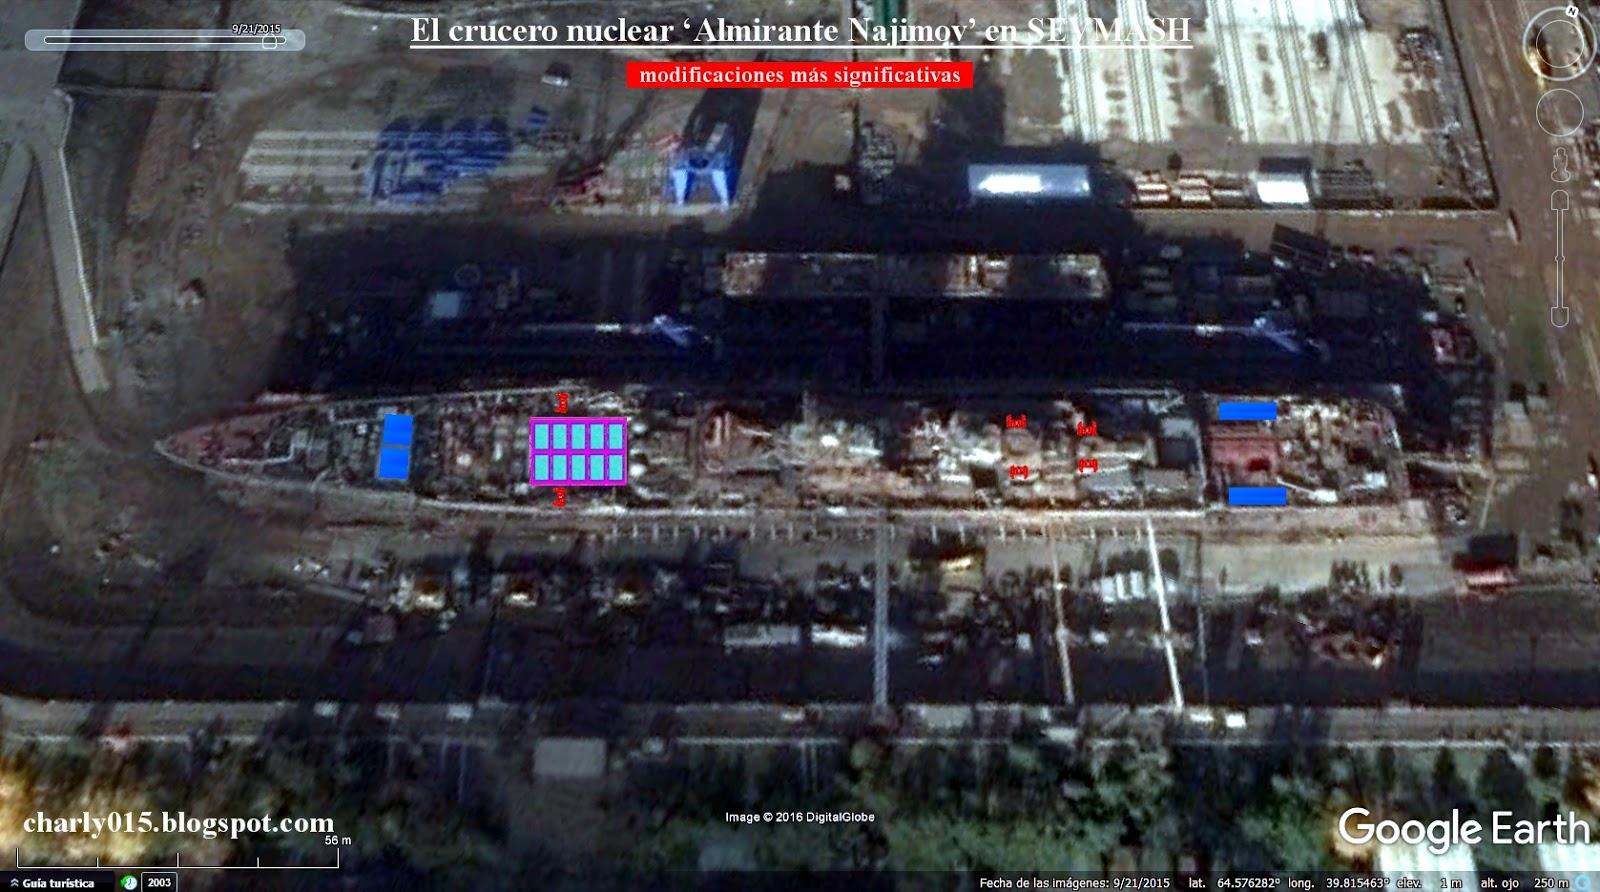 Upgraded Kirov class: Project 11442 [Admiral Nakhimov] - Page 14 1144%2Bmodificaciones%2Bprincipales%2B2